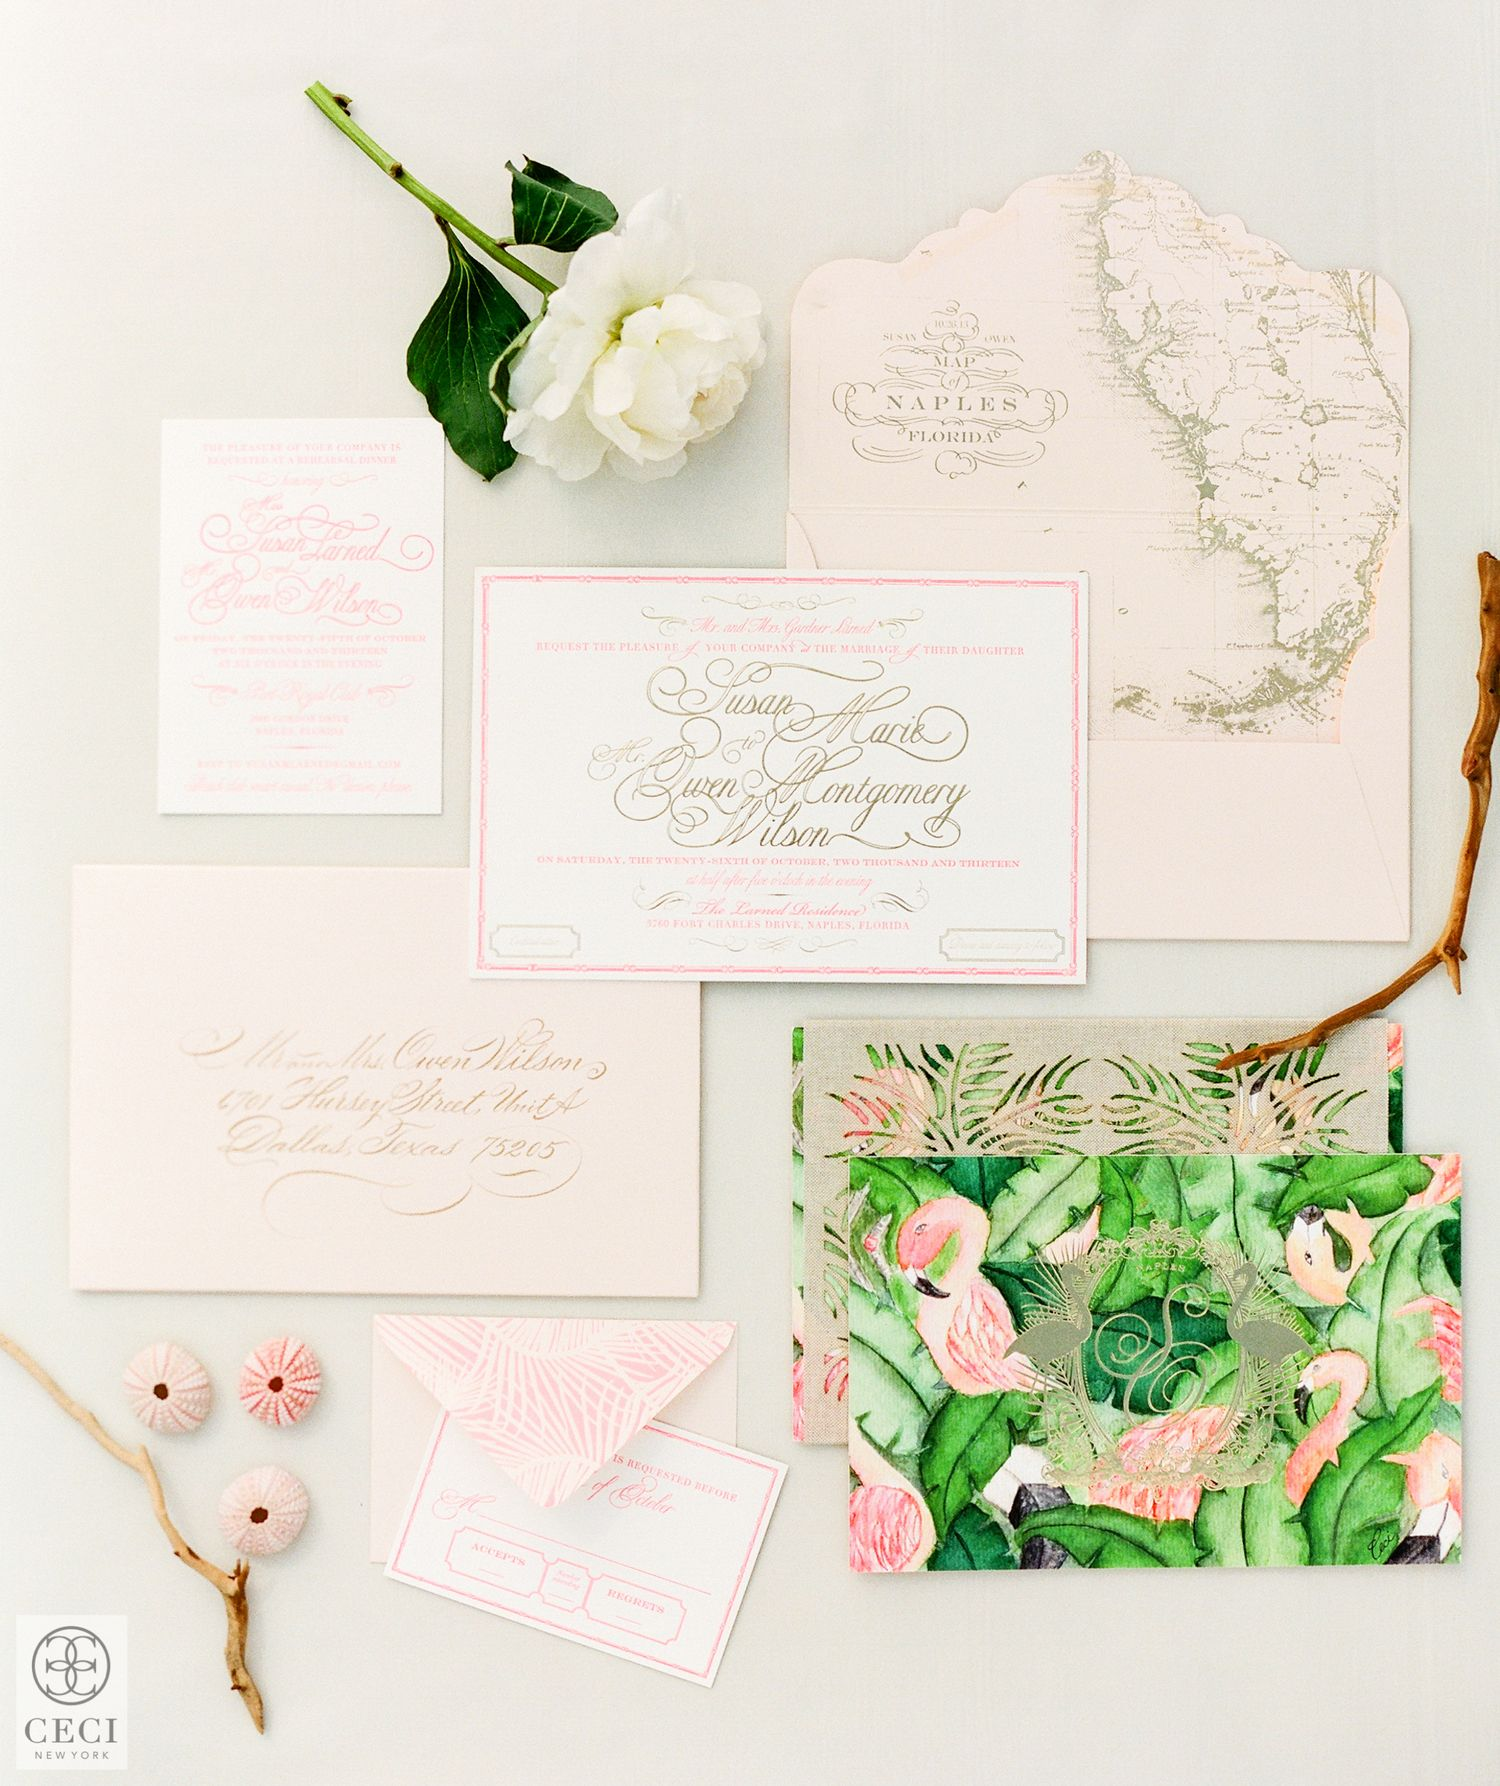 Flamingo pink inspired wedding invitation by CeCi New York | Wedding ...